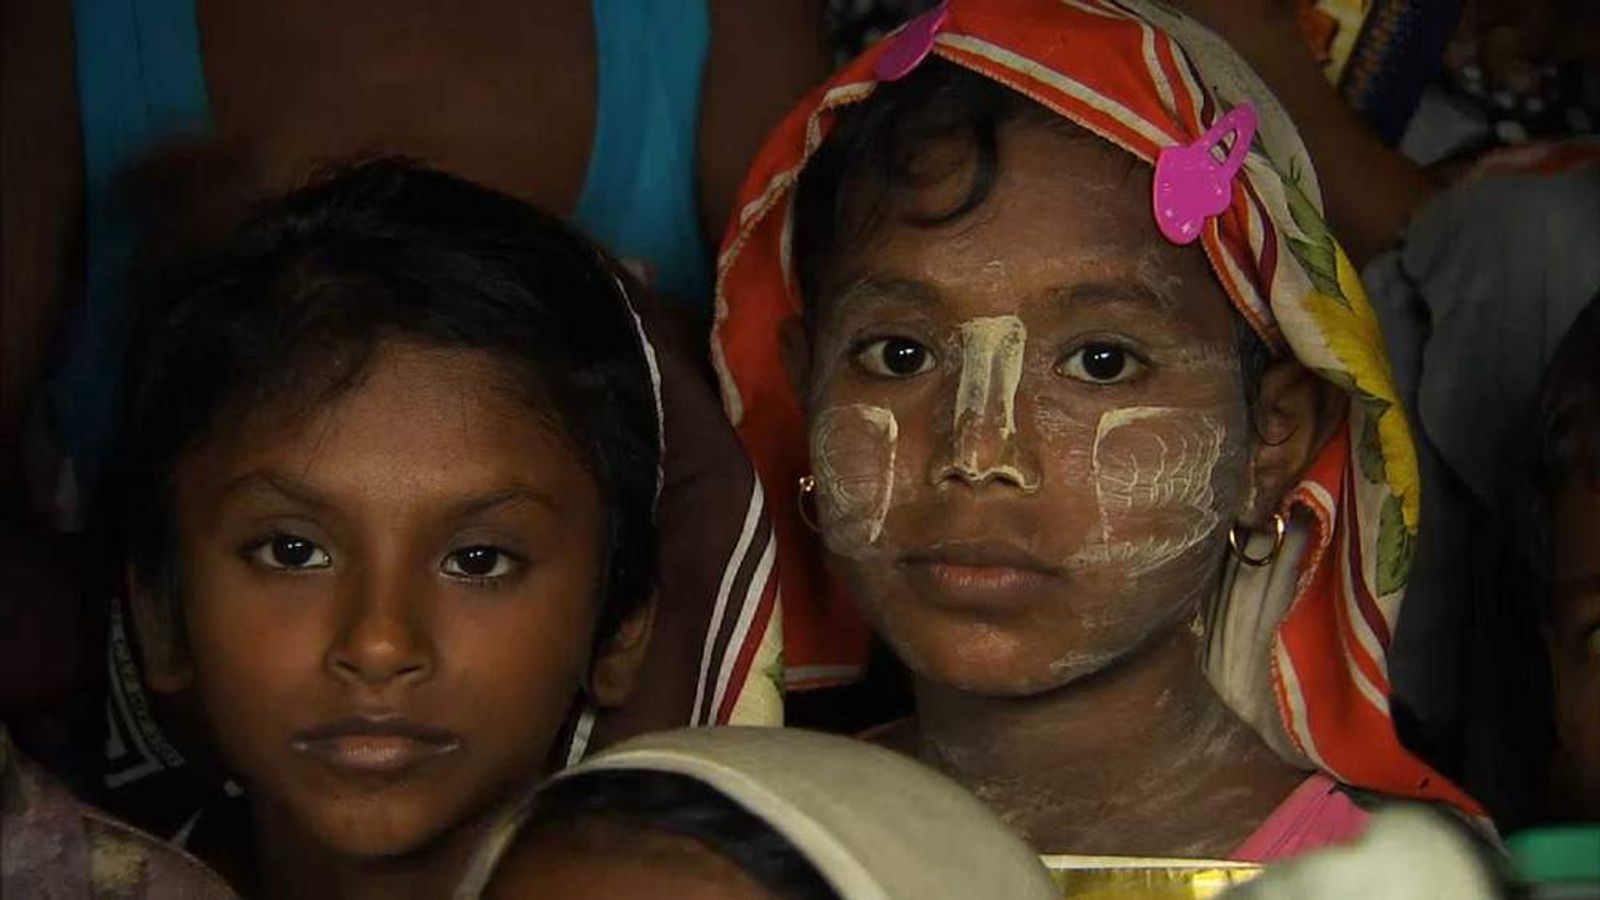 Muslim refugees in Burma